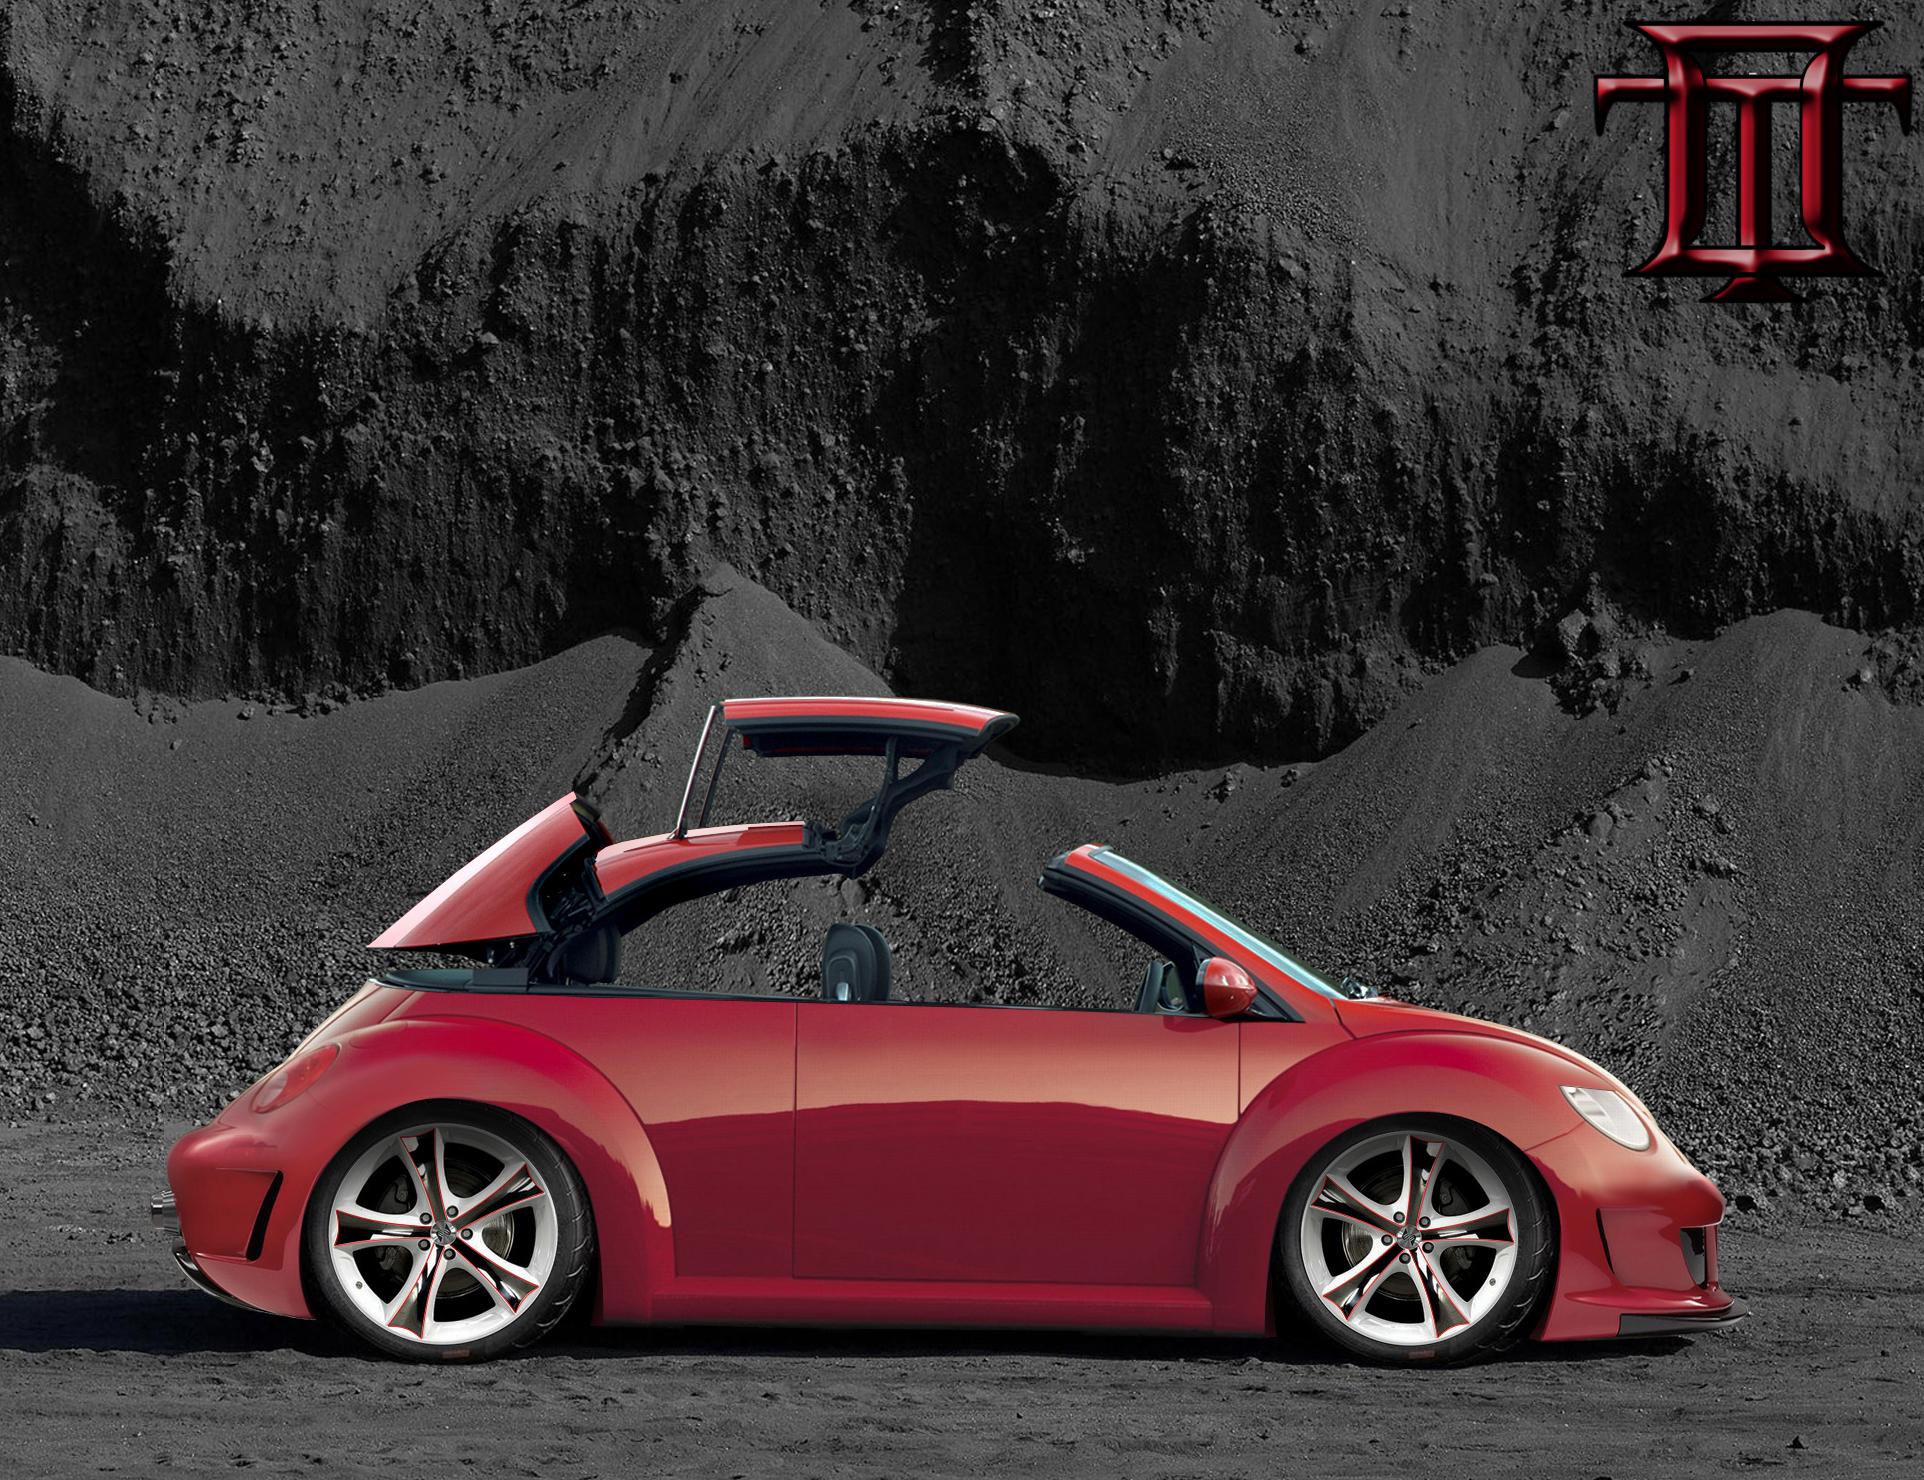 vw new beetle red by oki tuning on deviantart. Black Bedroom Furniture Sets. Home Design Ideas